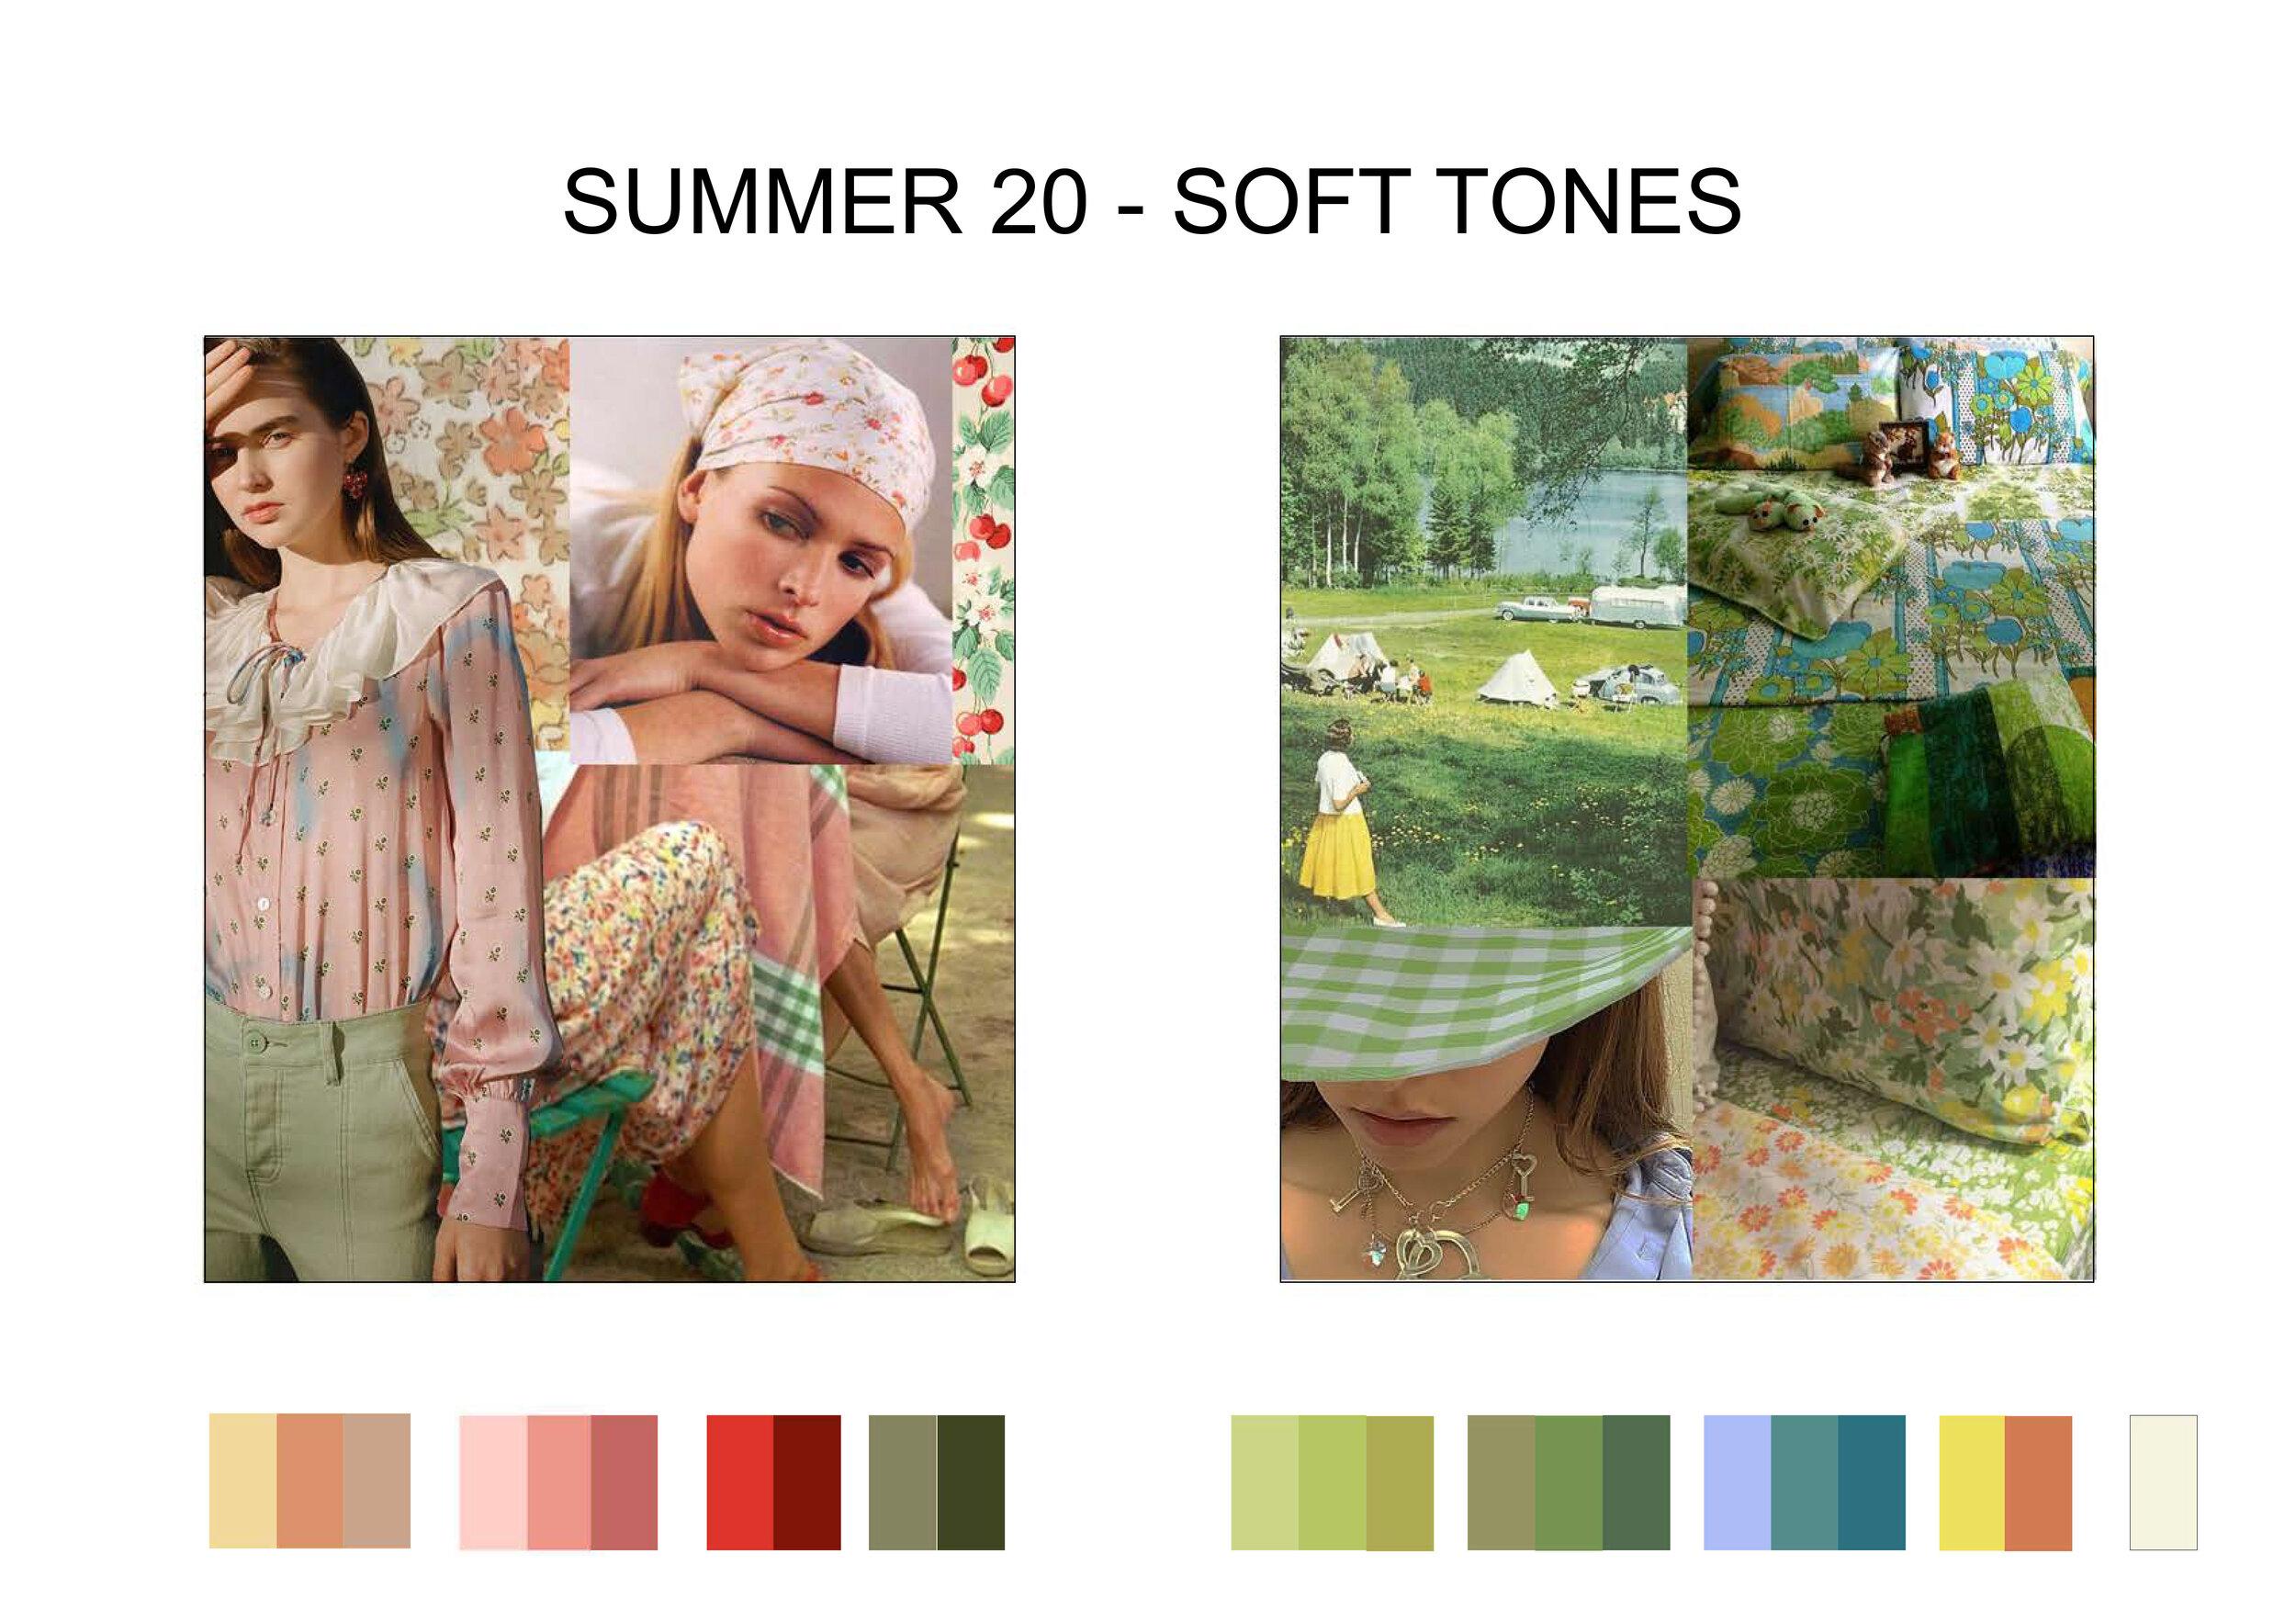 SUMMER20_COLOR1_SOFTS.jpg